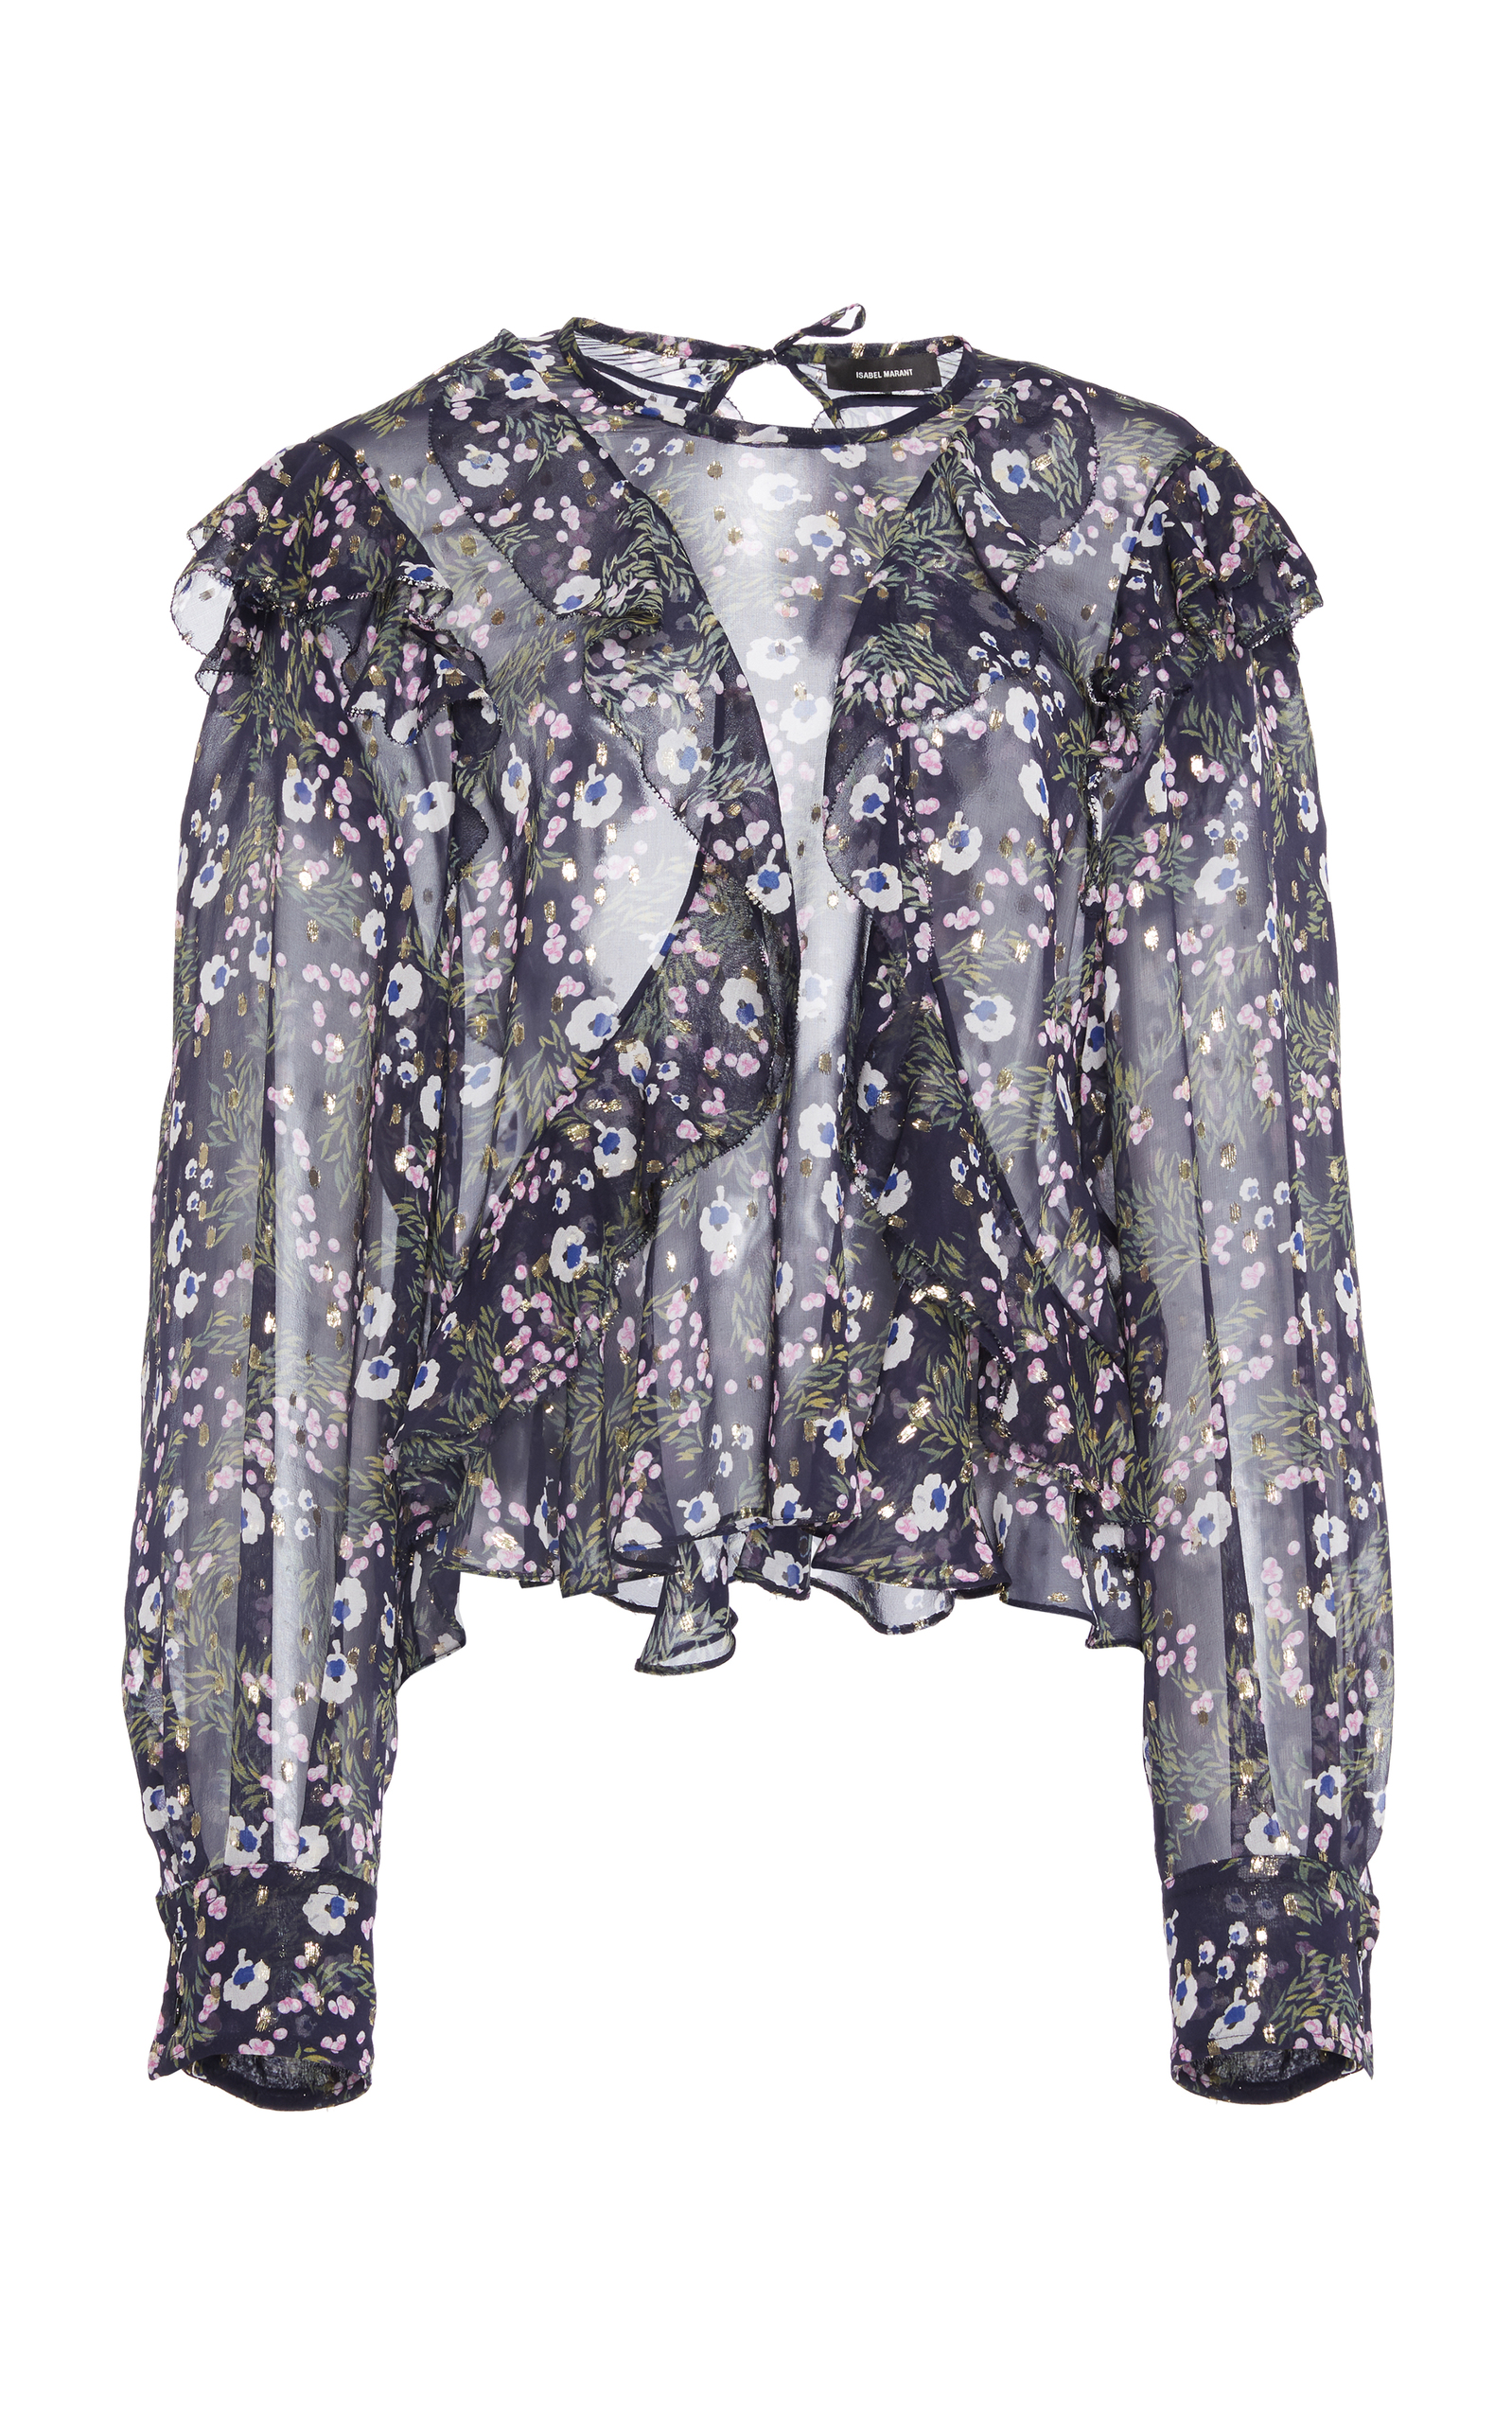 9a509c1d592d9c large_isabel-marant-floral-muster-metallic-silk-top.jpg